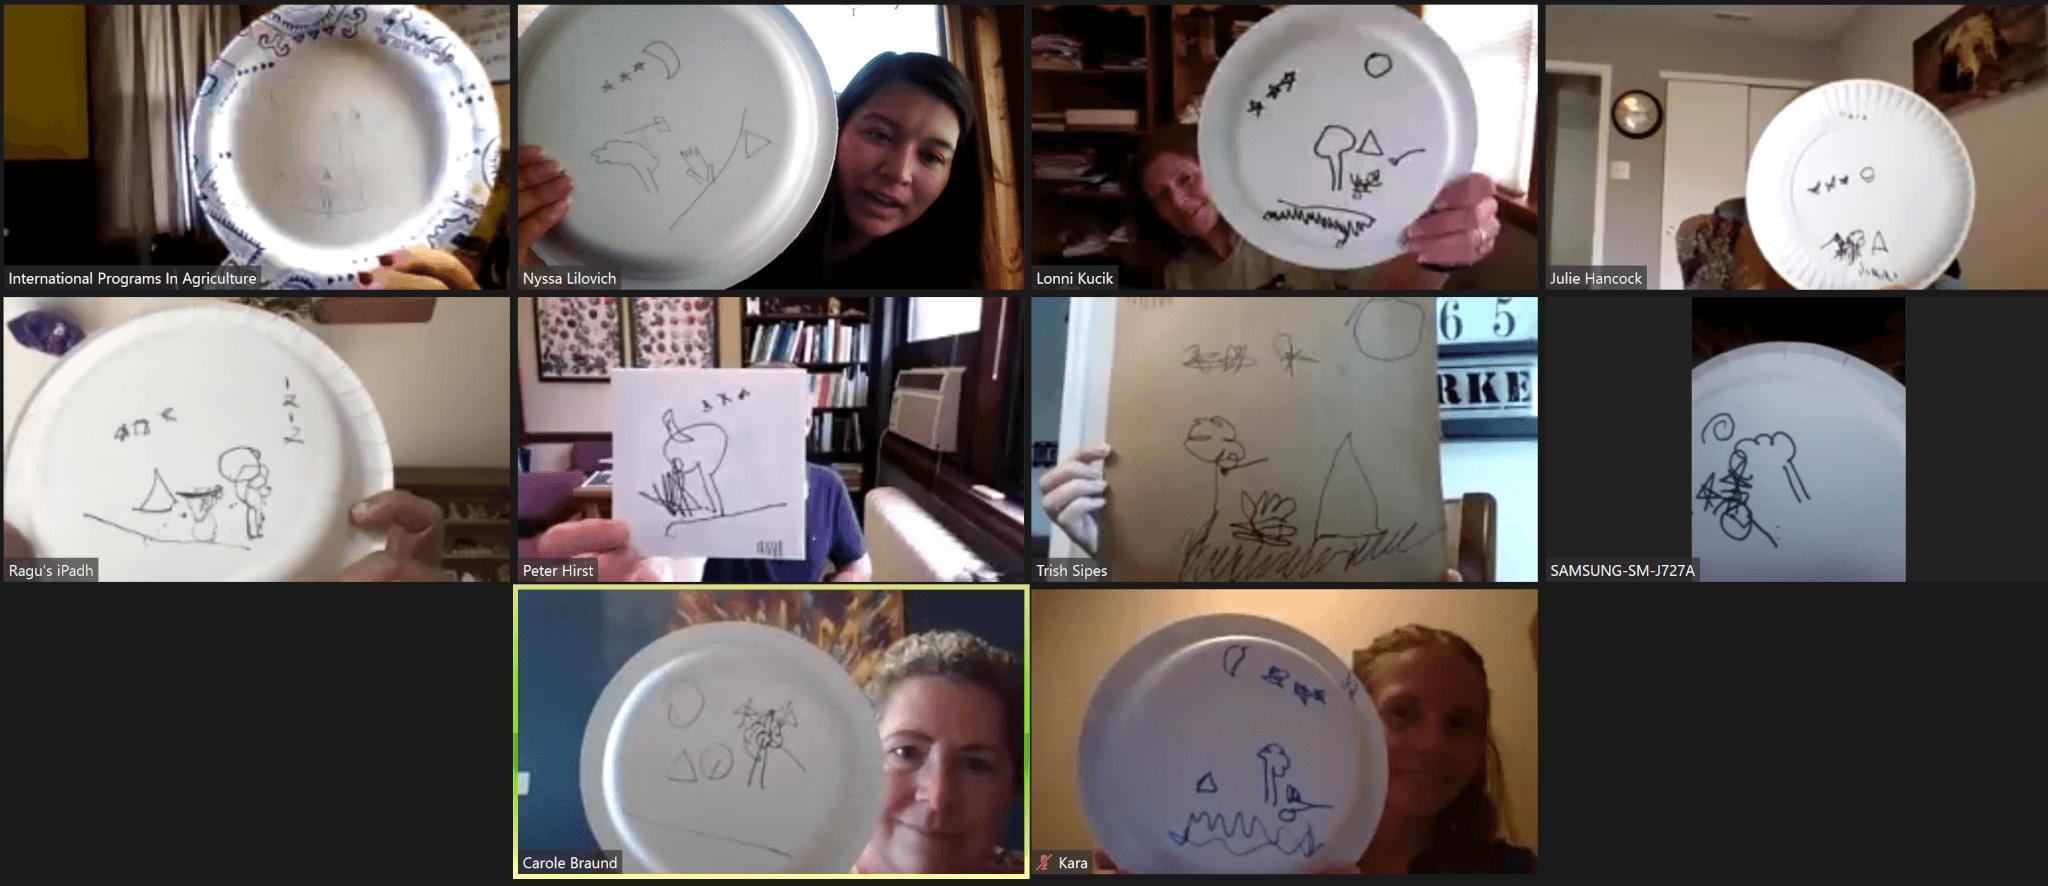 IPIA Group playing Head Drawing